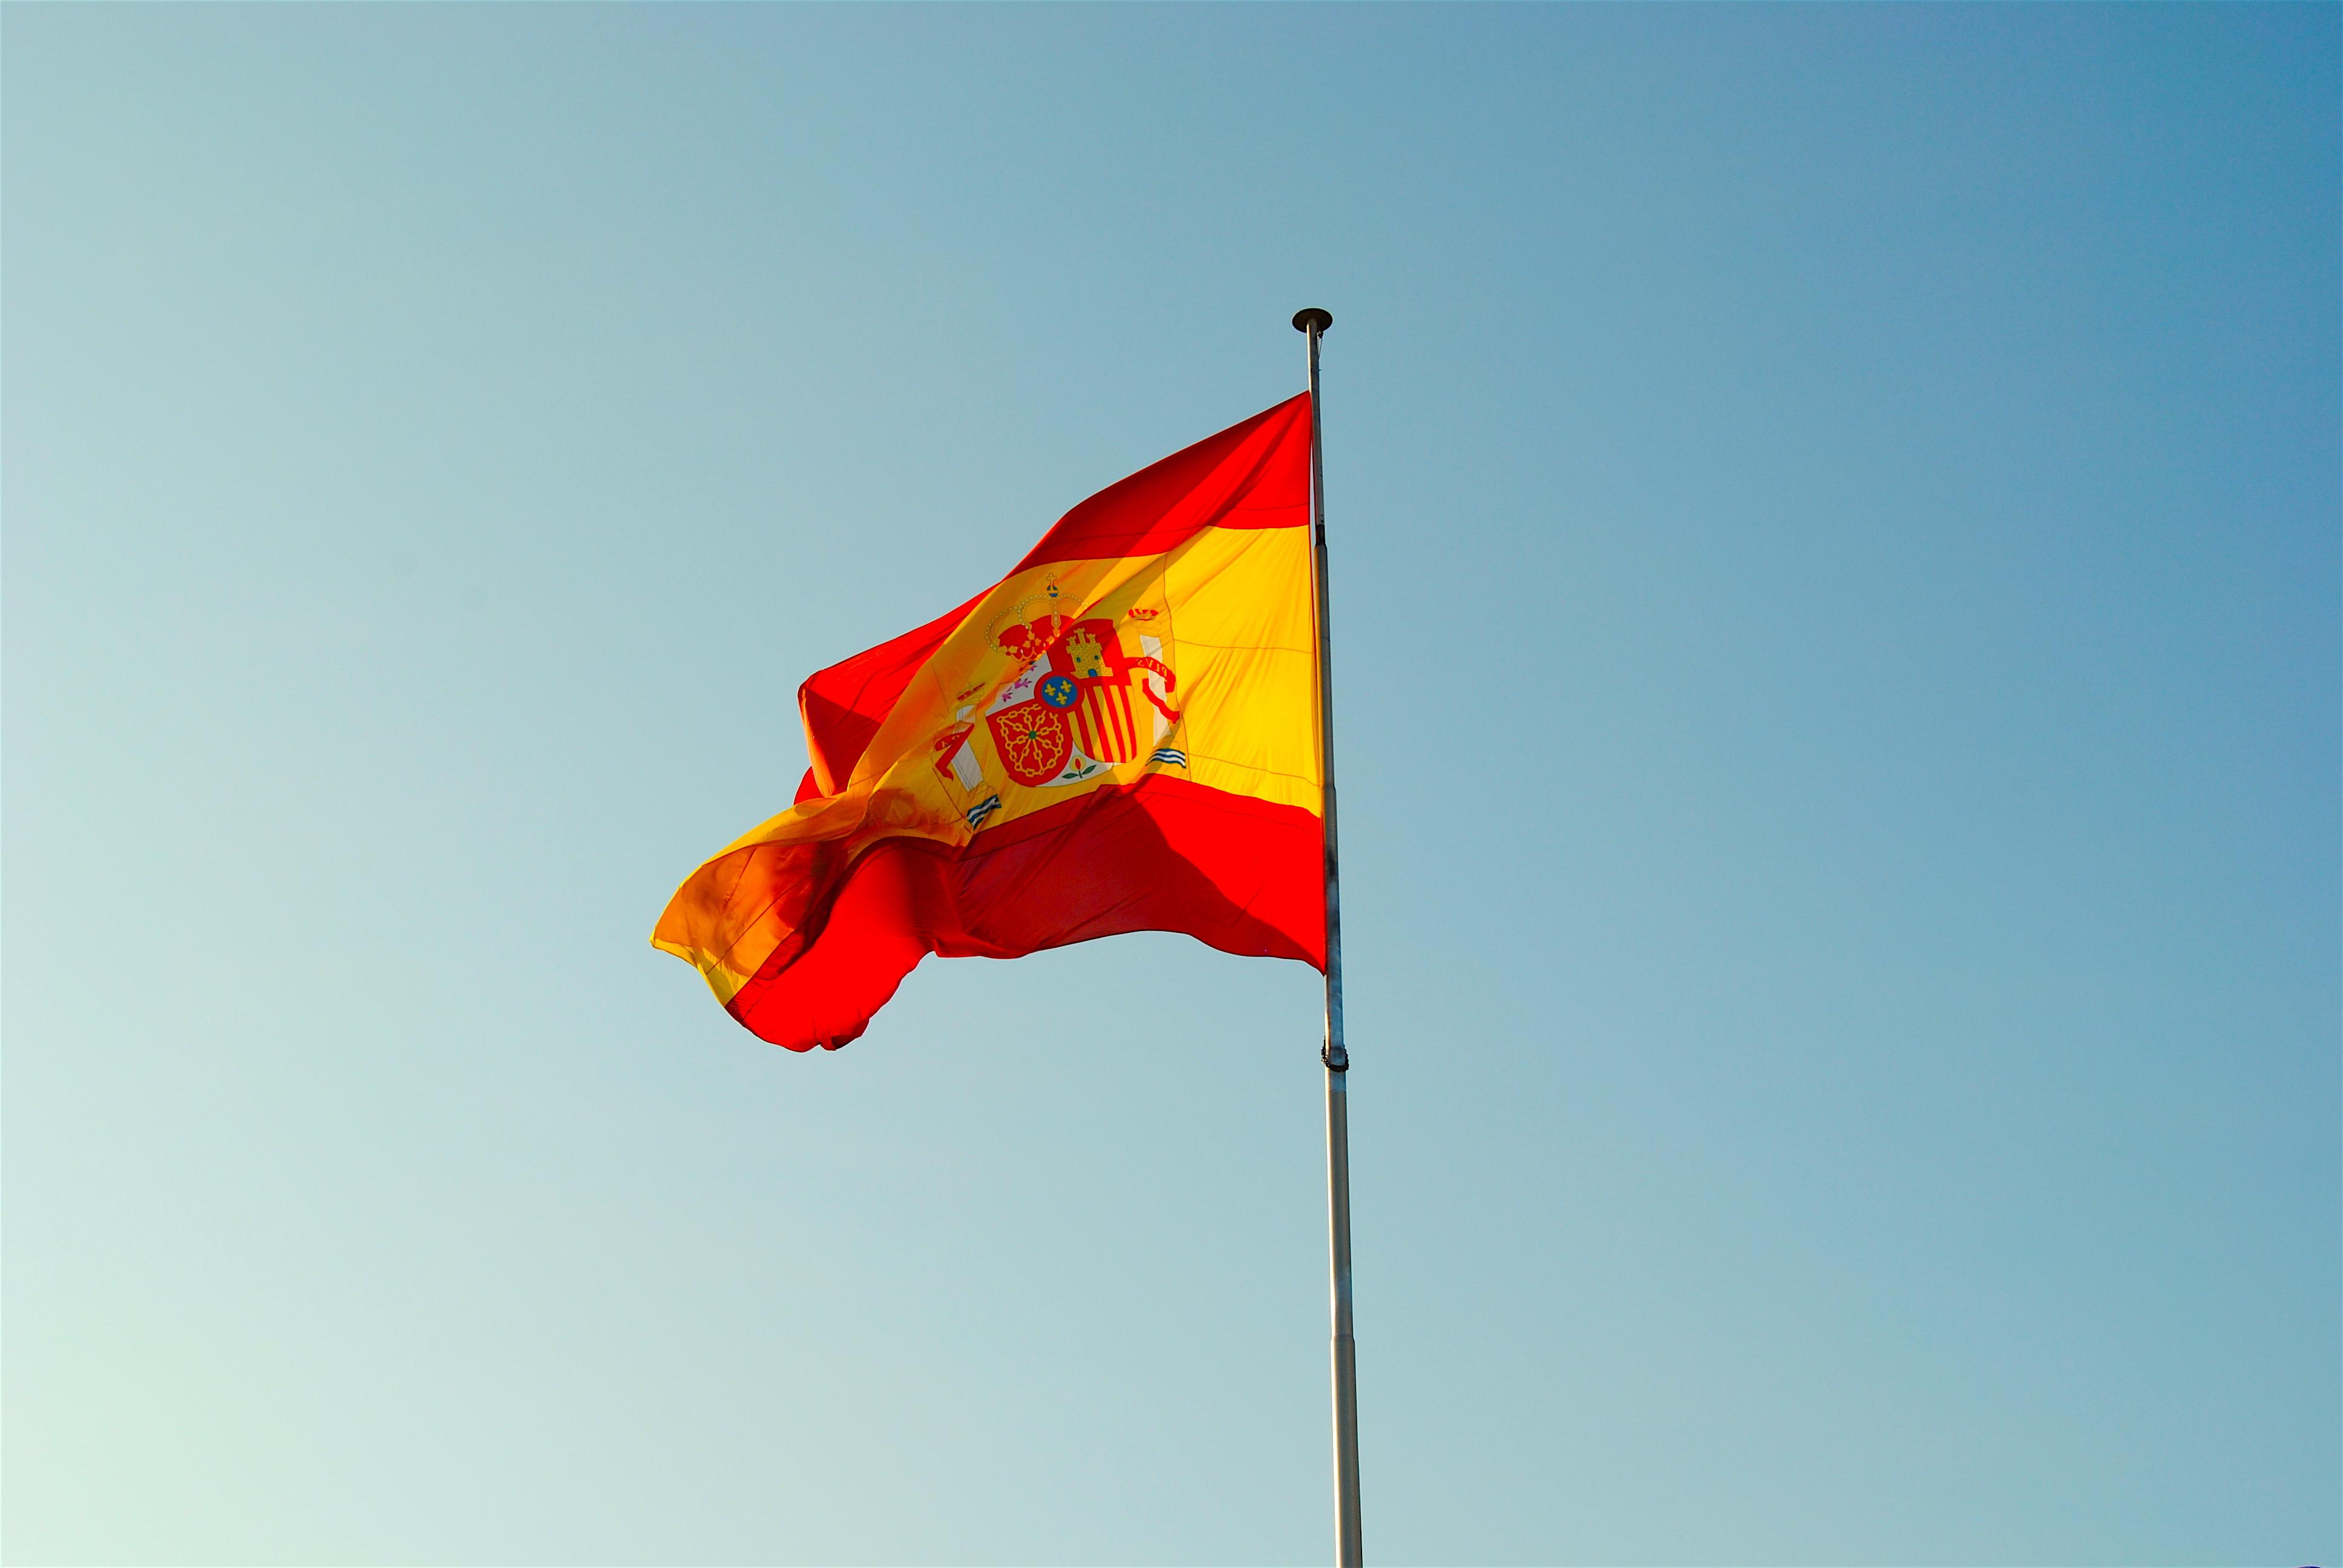 Private investigators in Spain